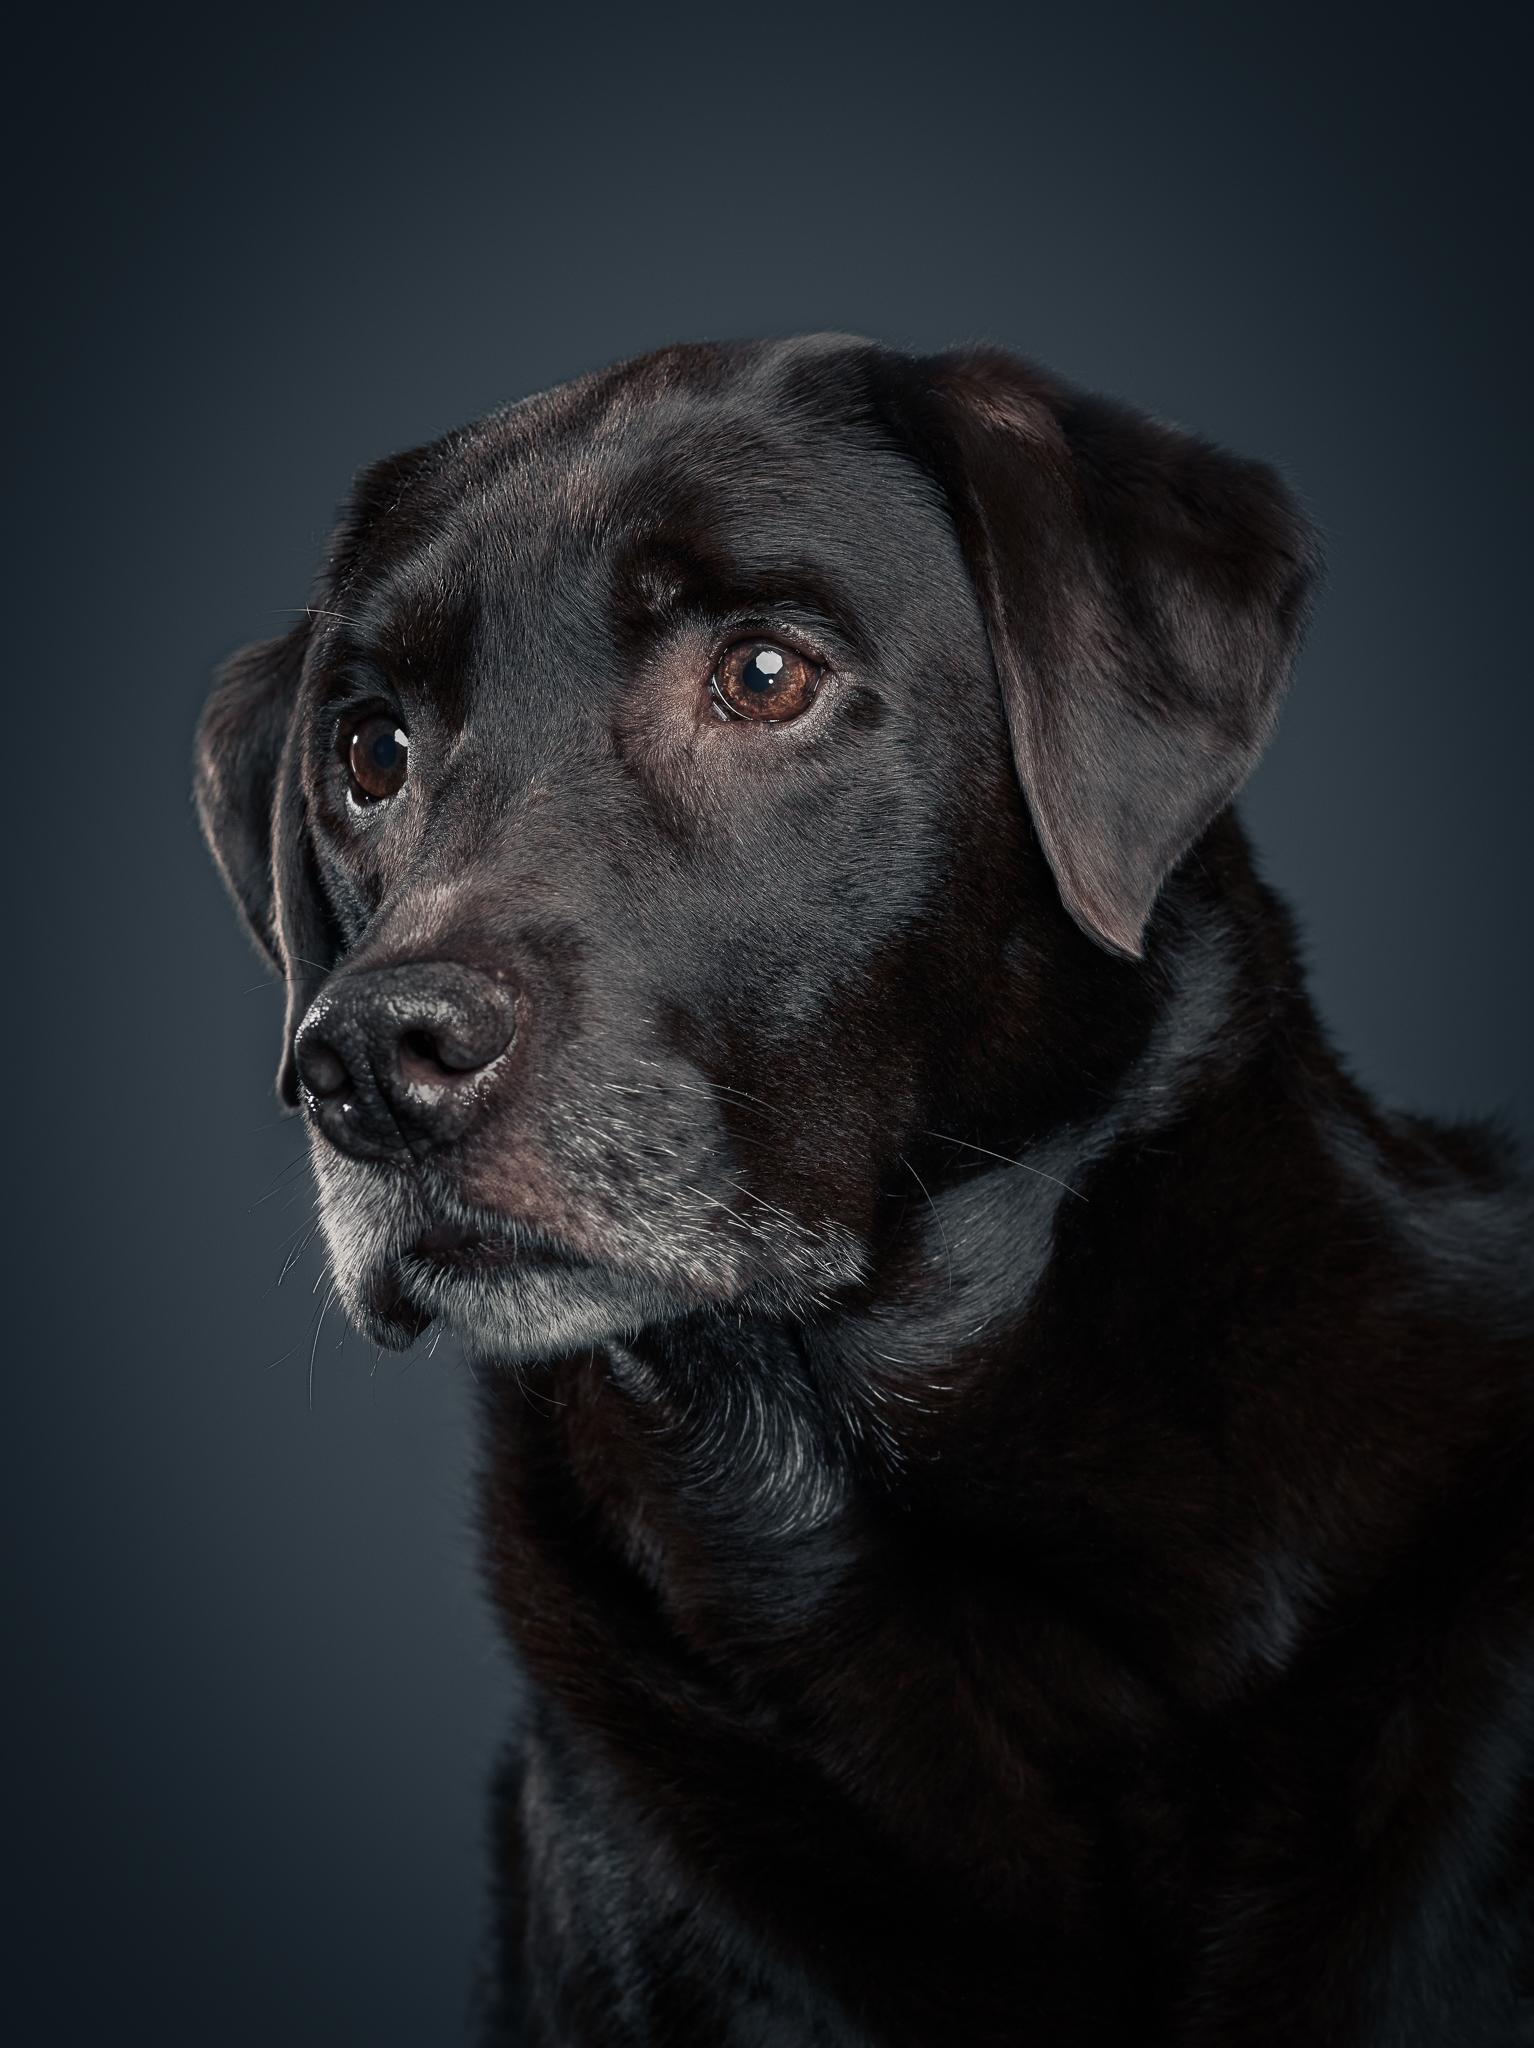 klaus-dyba-dog-photography-5.jpg